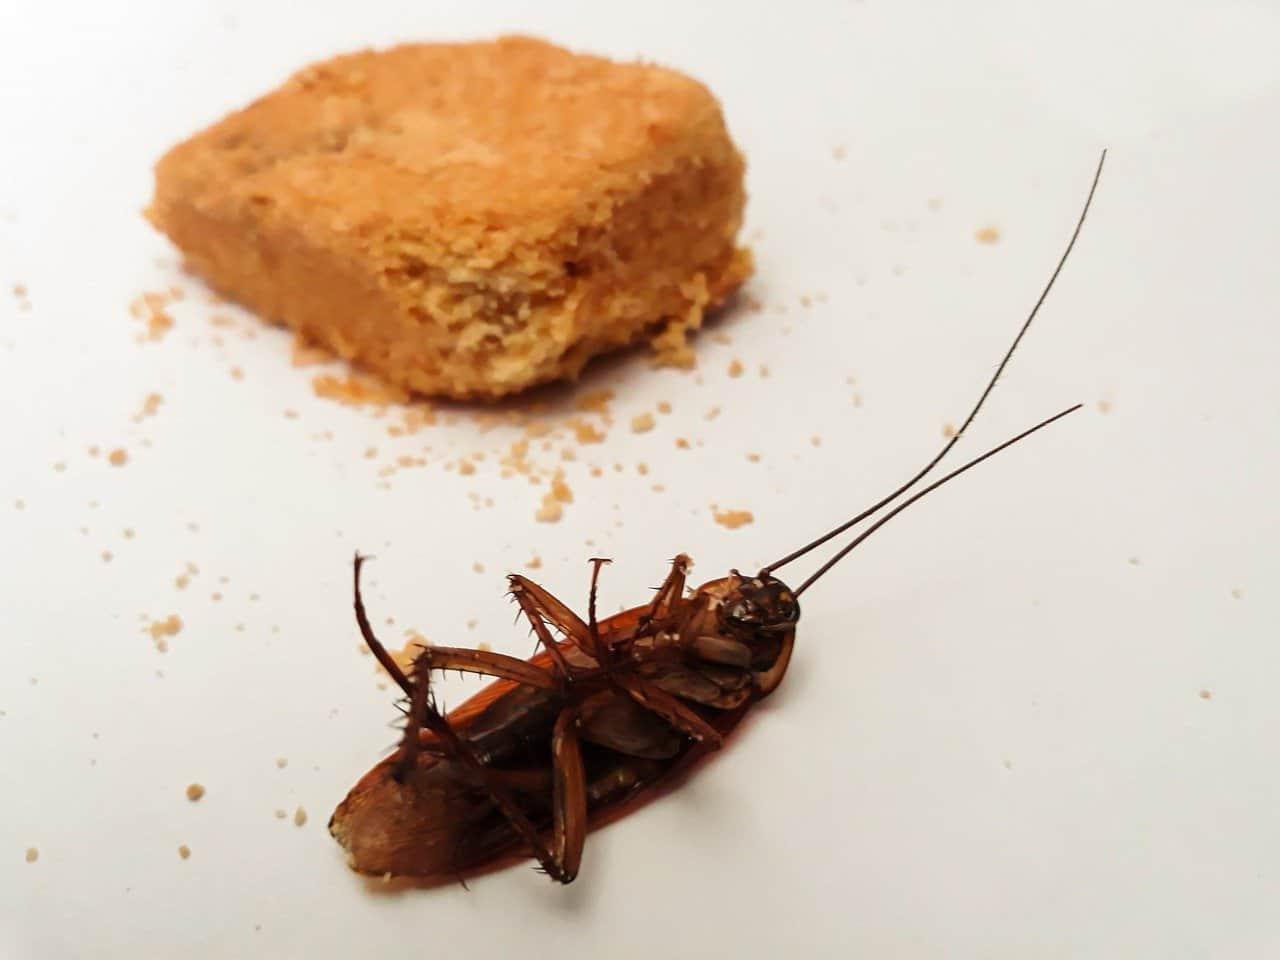 Dog ate combat roach bait!